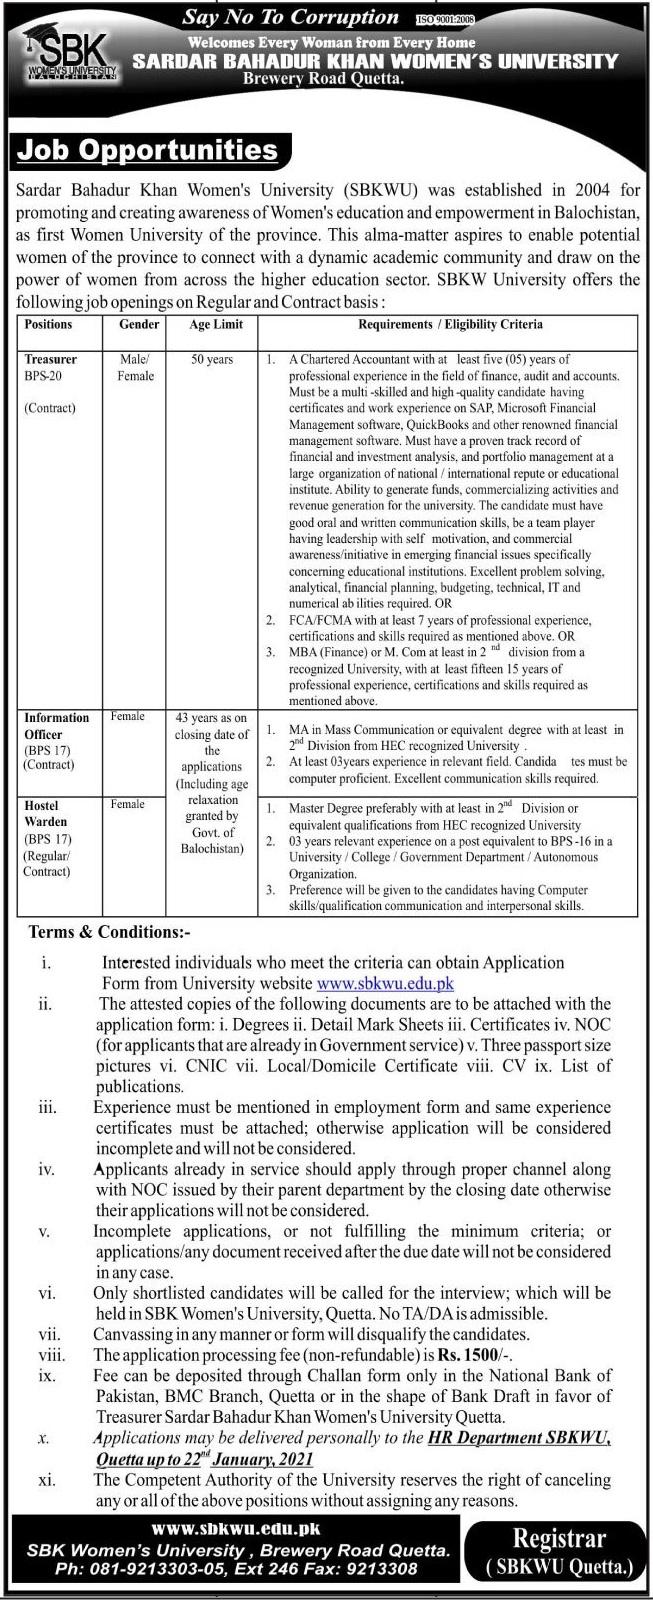 Sardar Bahadur Khan Women's University Jobs 2021